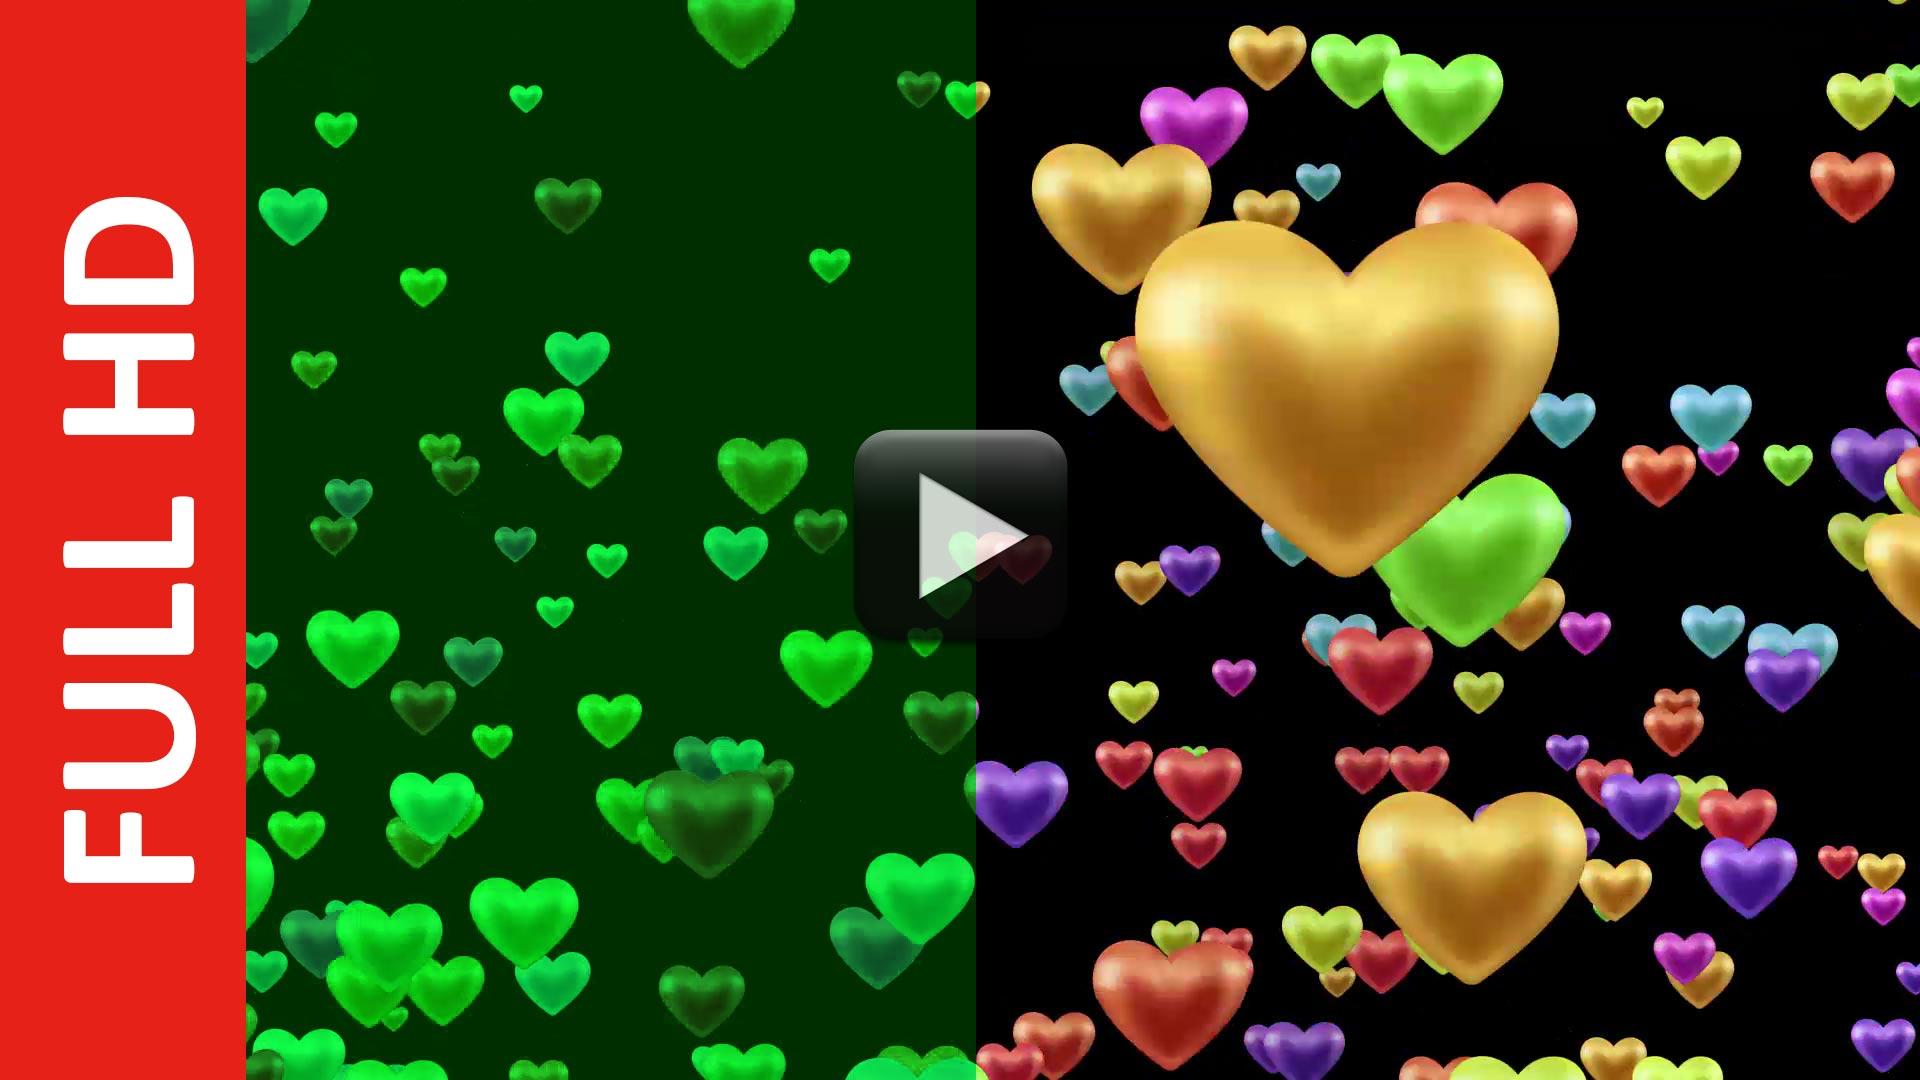 Blinking Hearts Shapes Love Animation Background